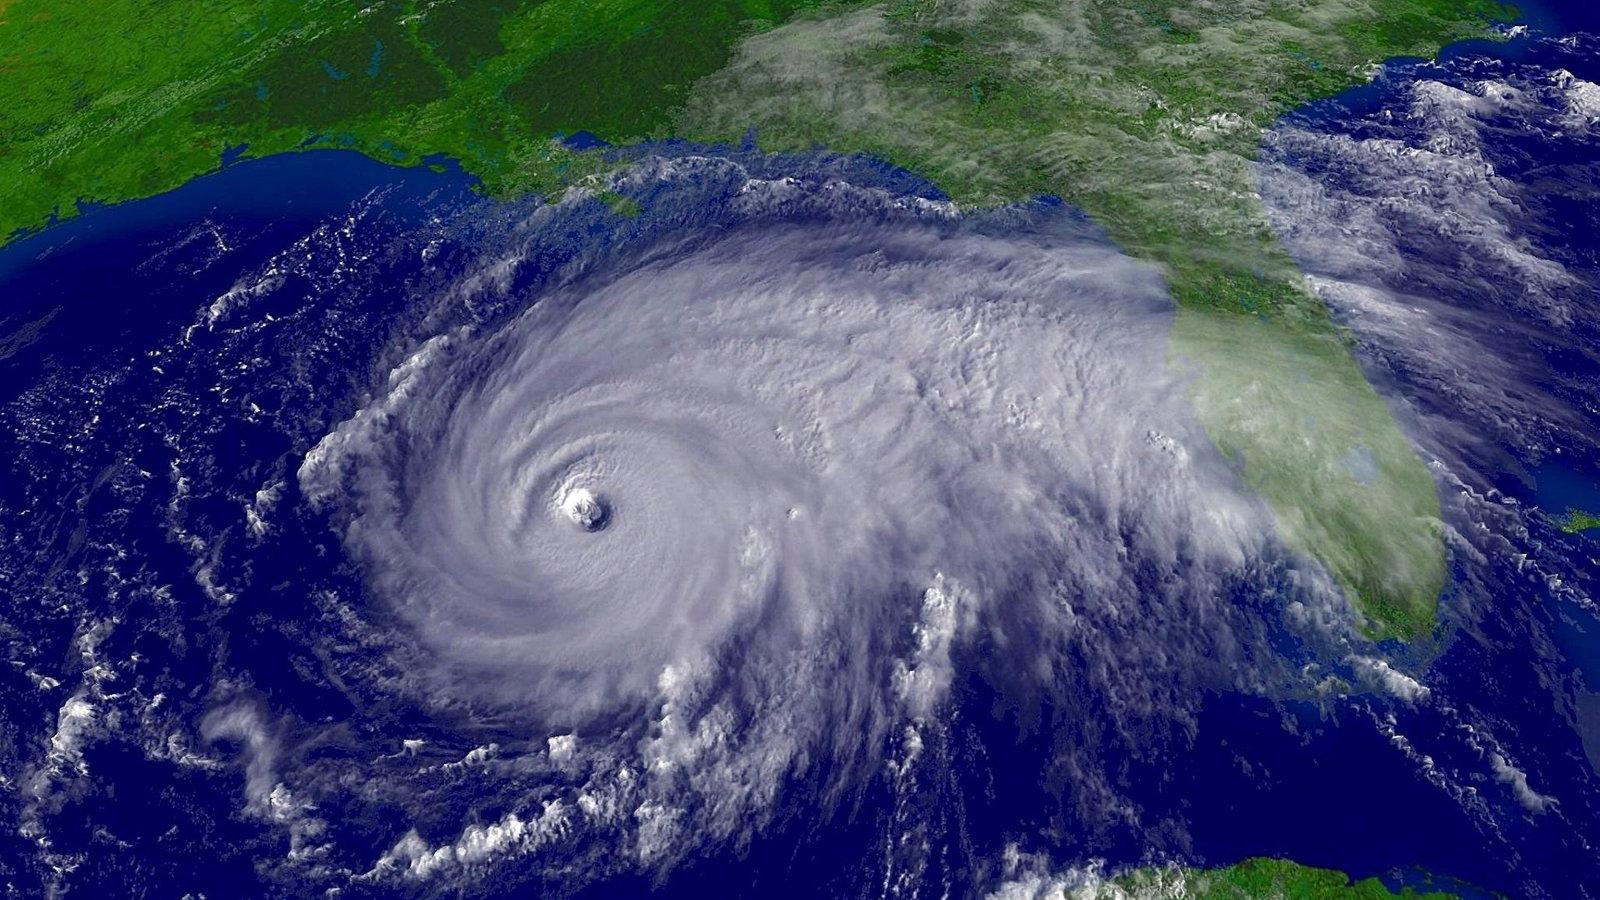 klima klimaforschung klimaforschung klima natur